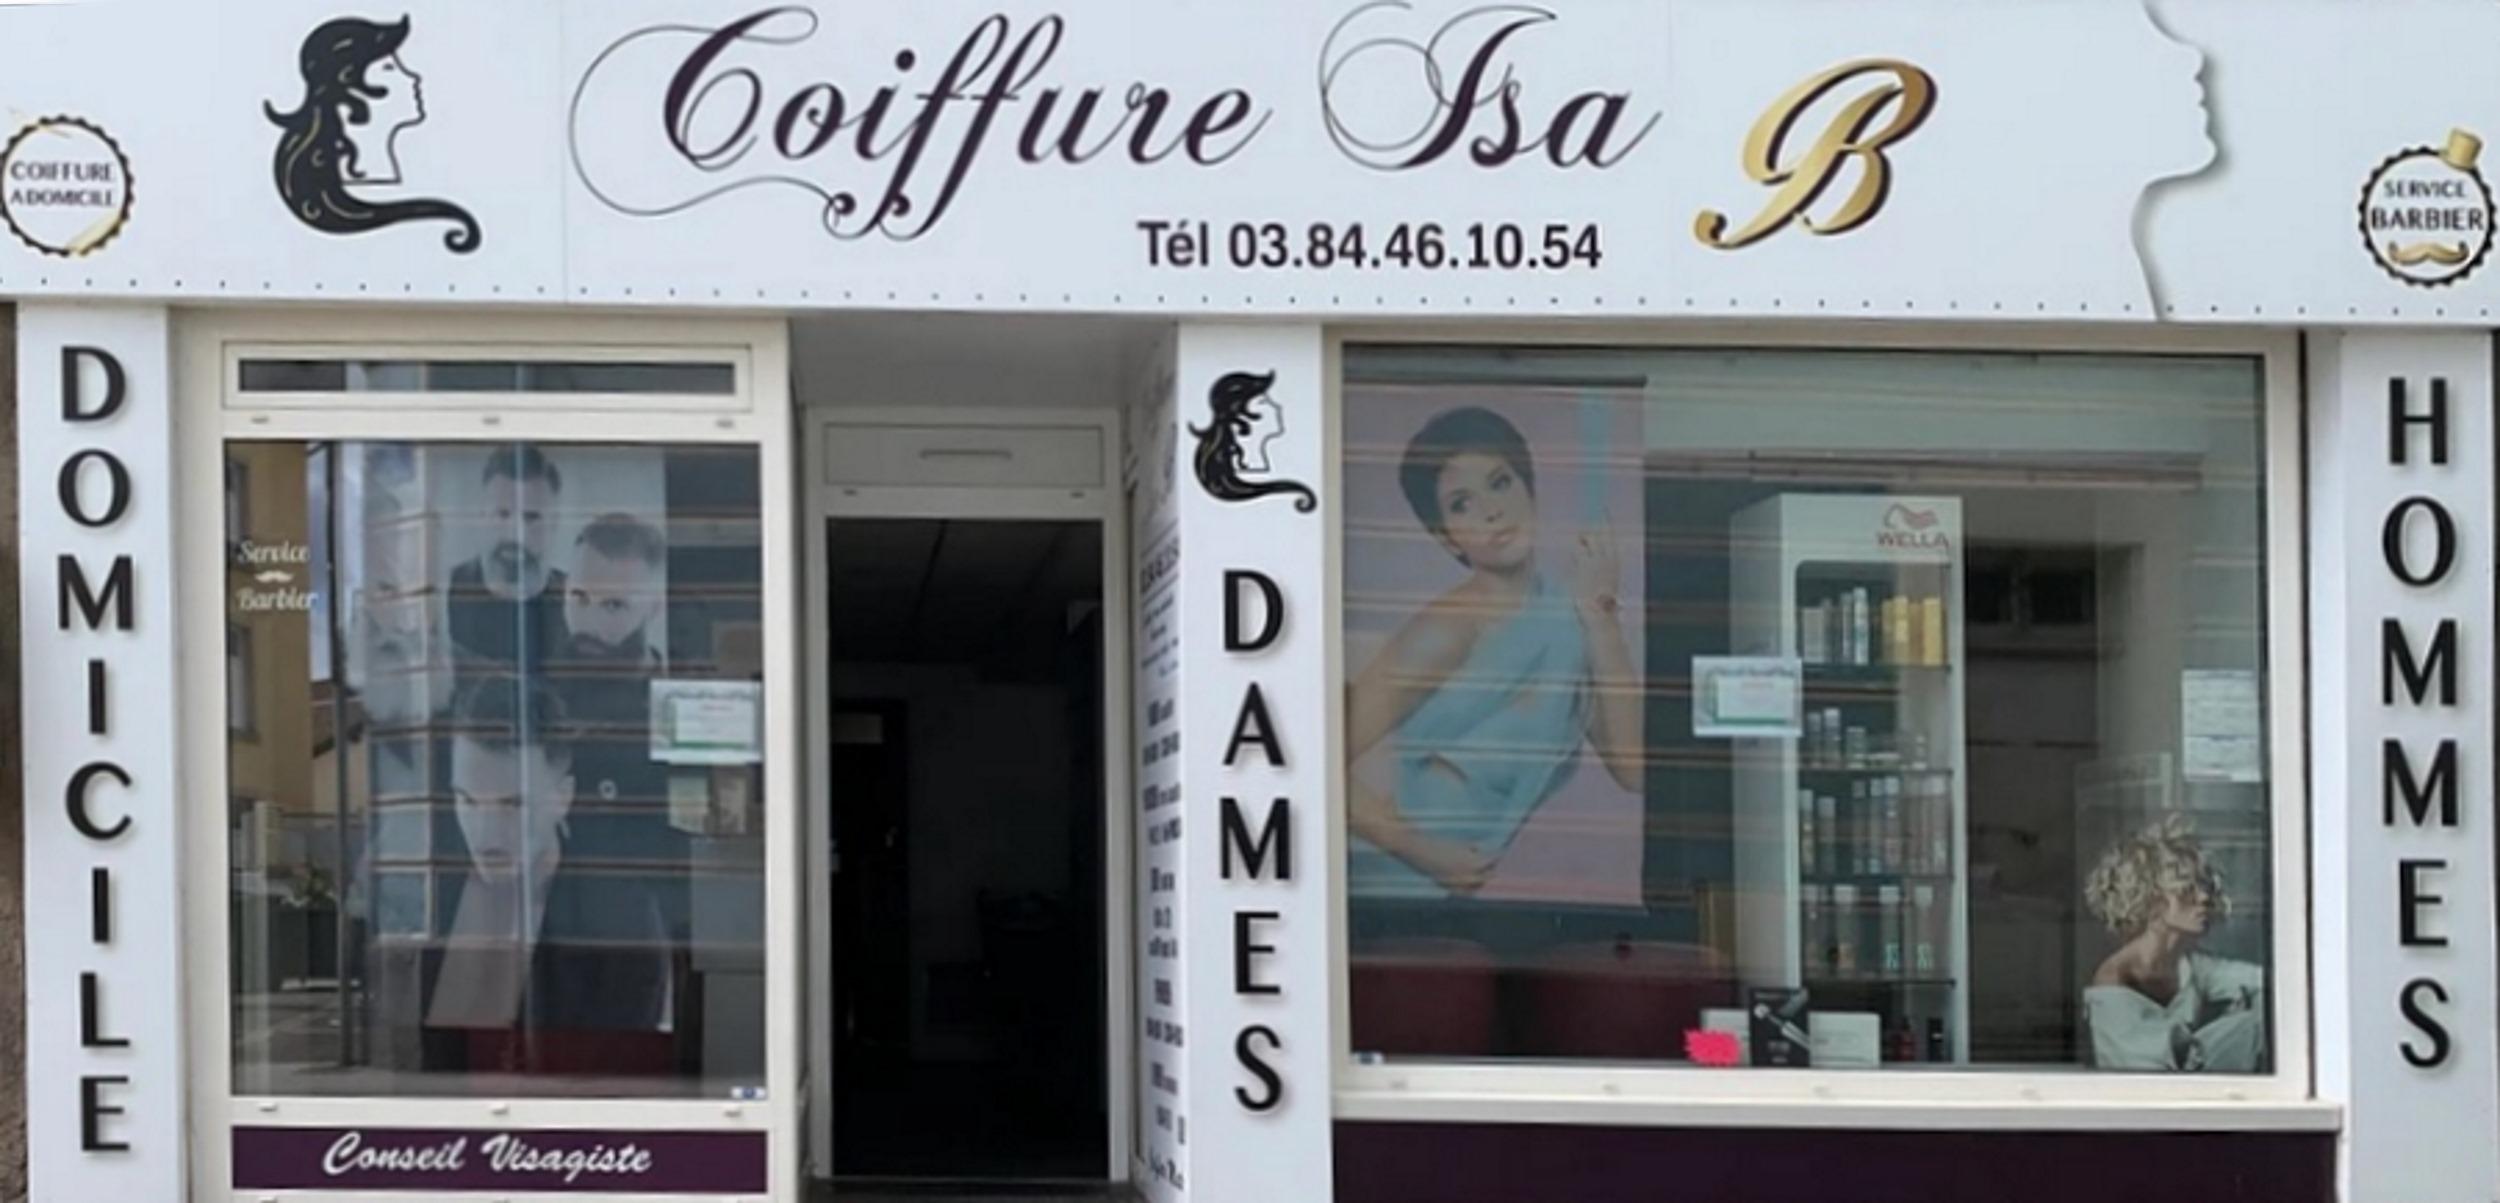 Coiffure Isa.B - Hommes et Femmes